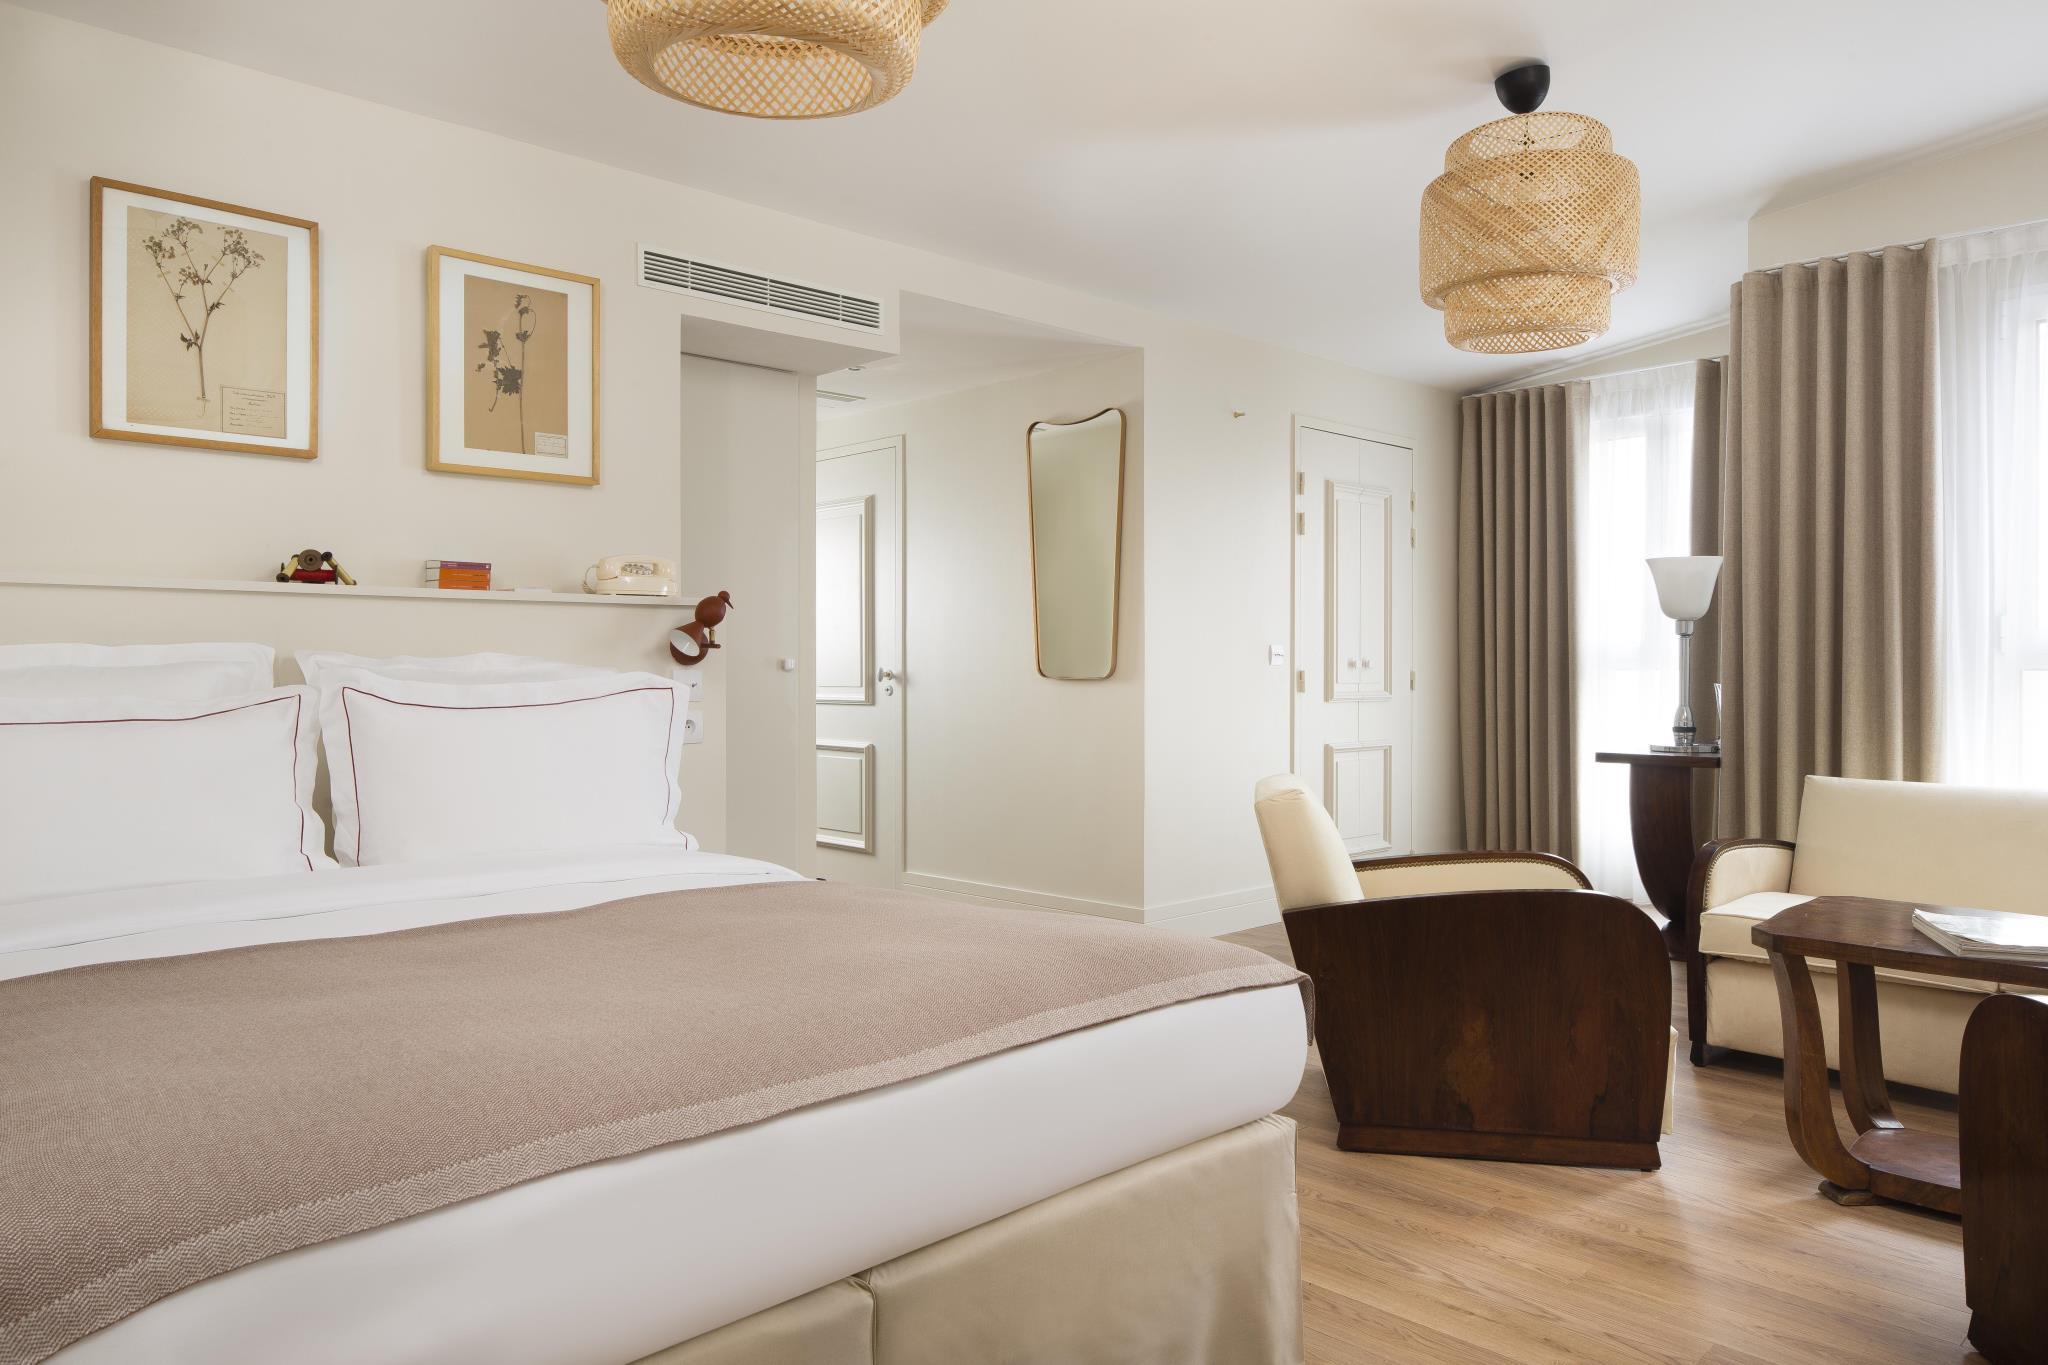 Hotel Celeste Batignolles Montmartre